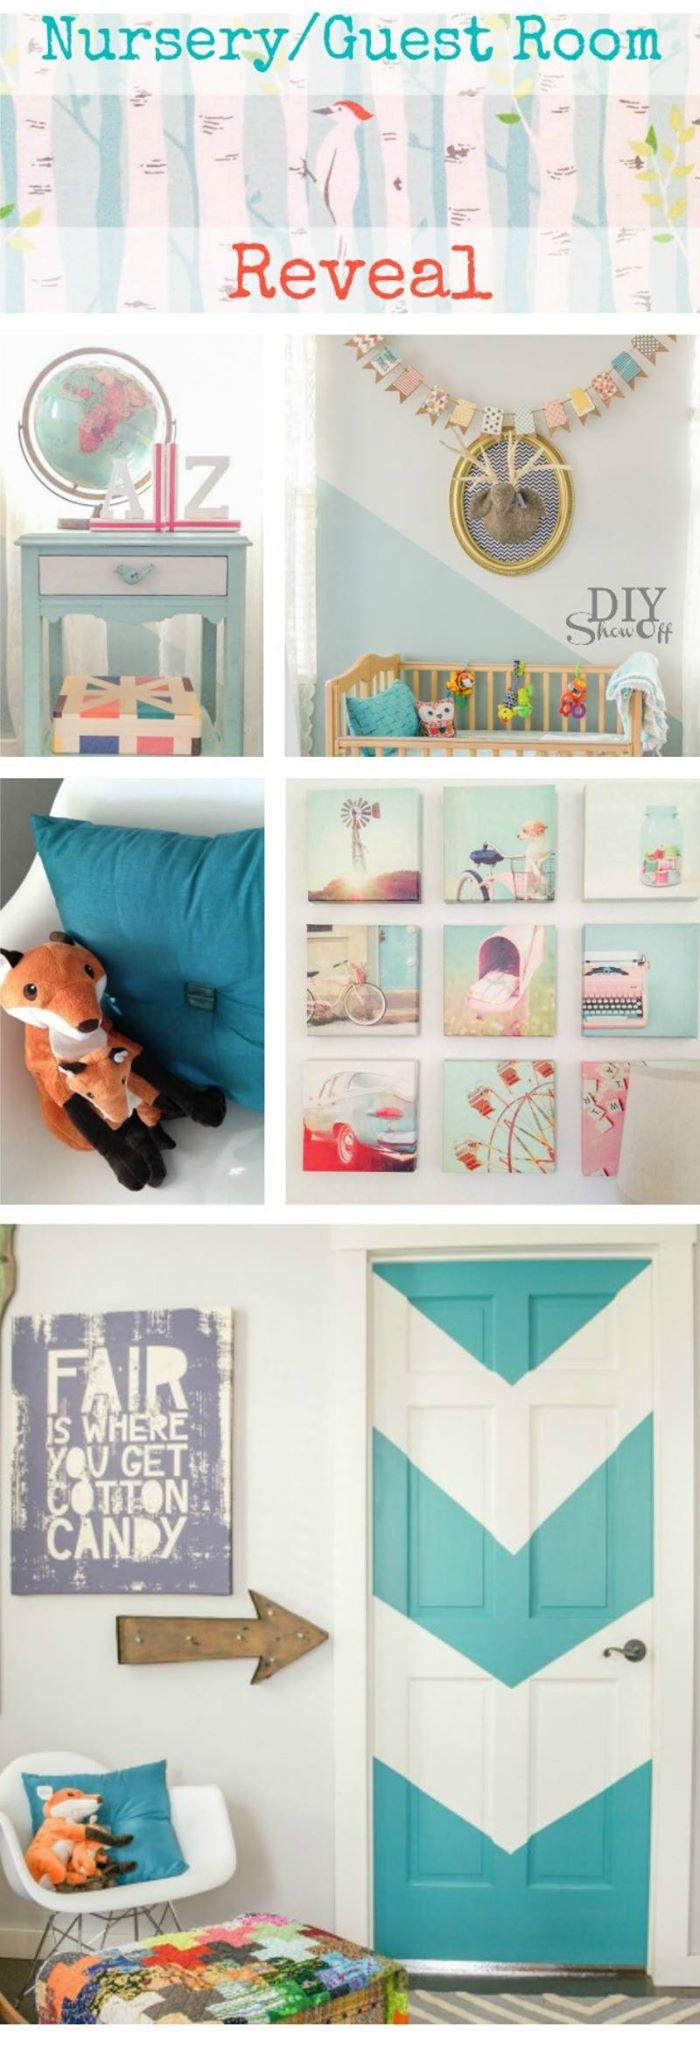 combined nursery/guest room @diyshowoff